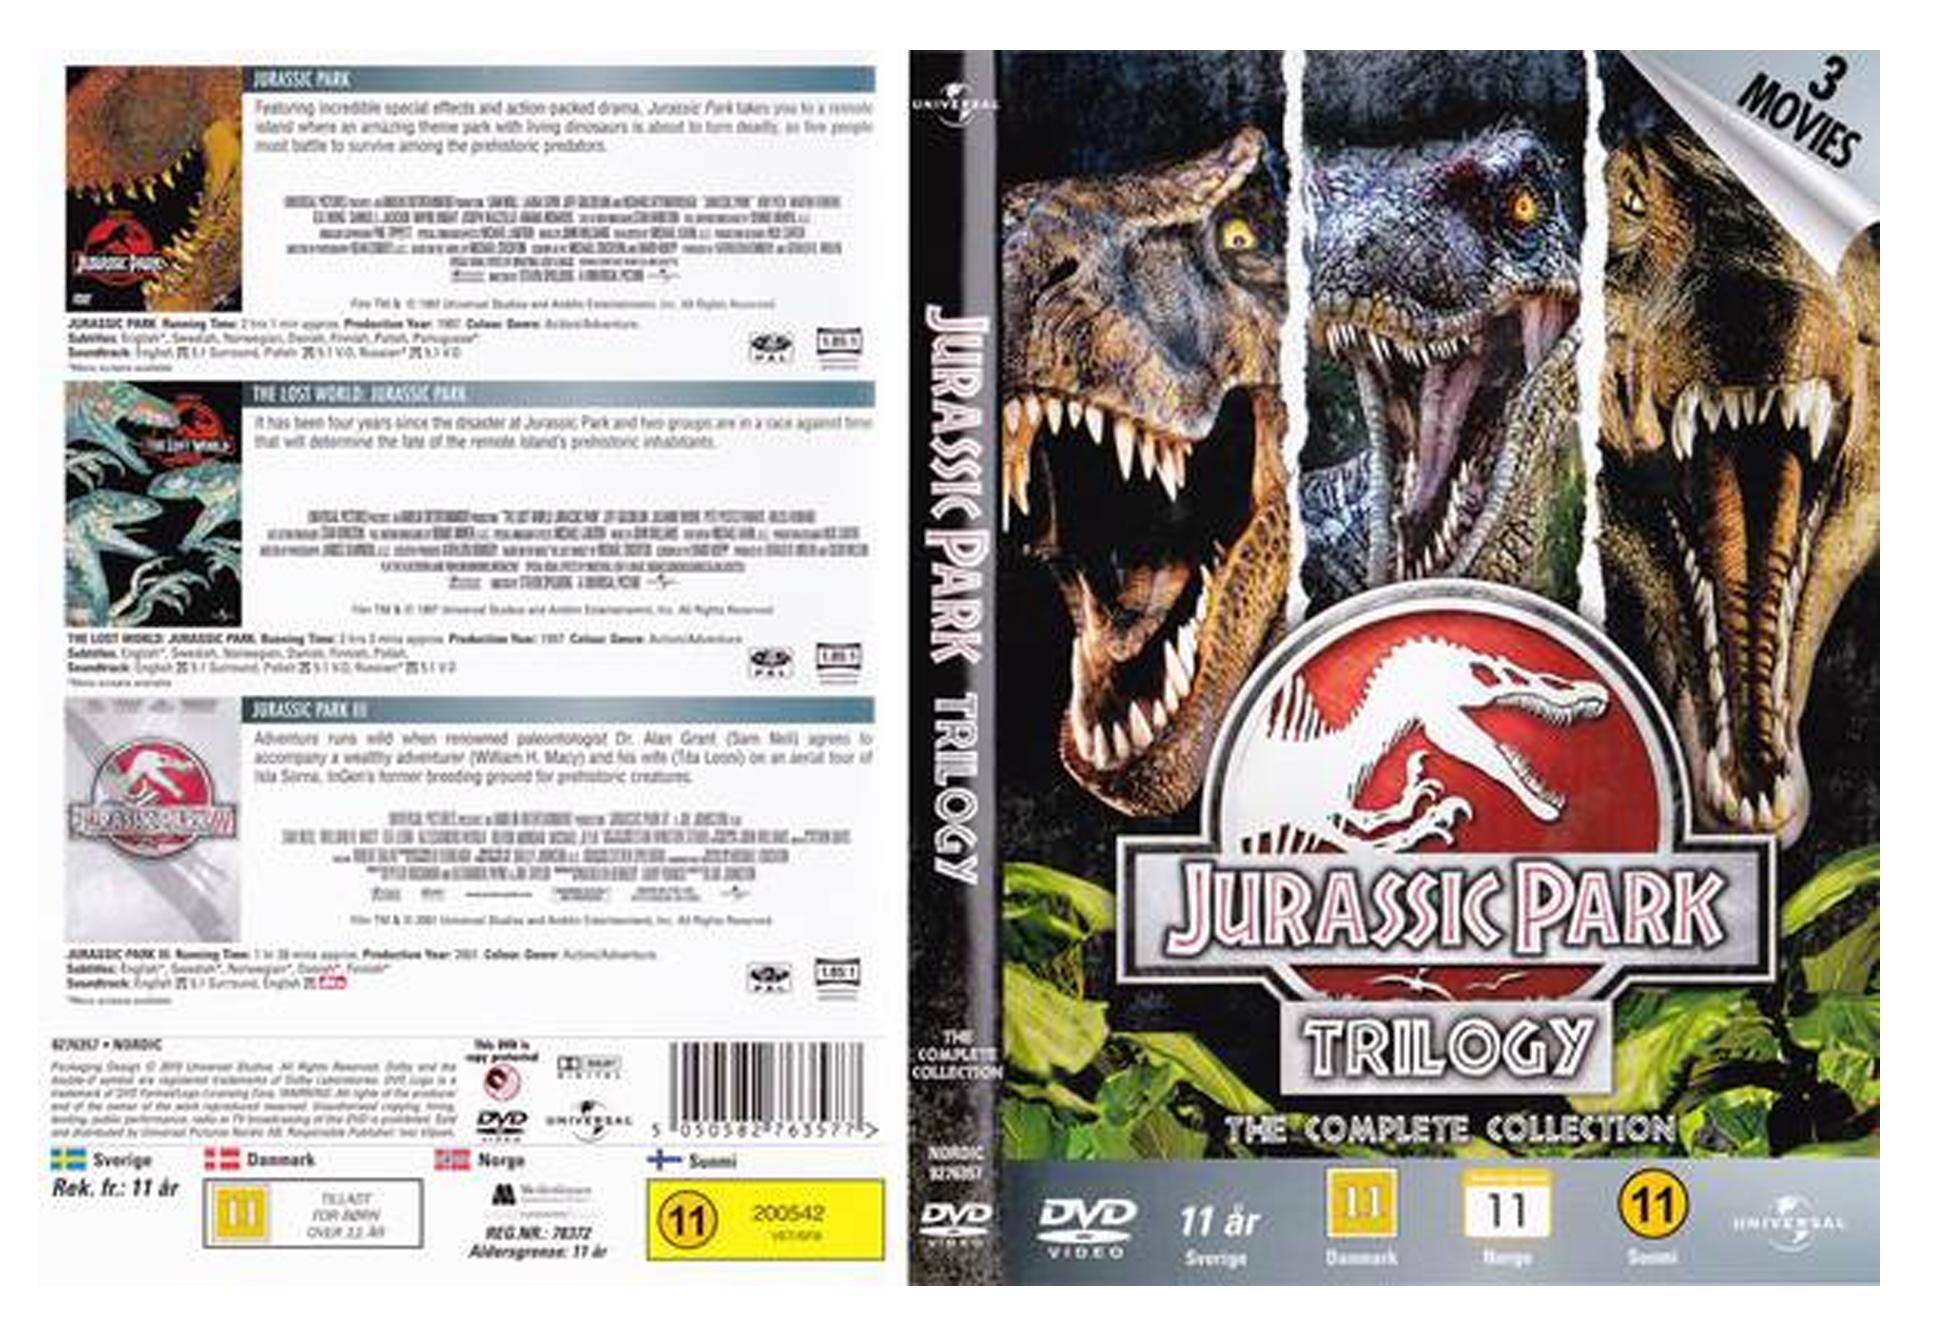 trilogy02.jpg